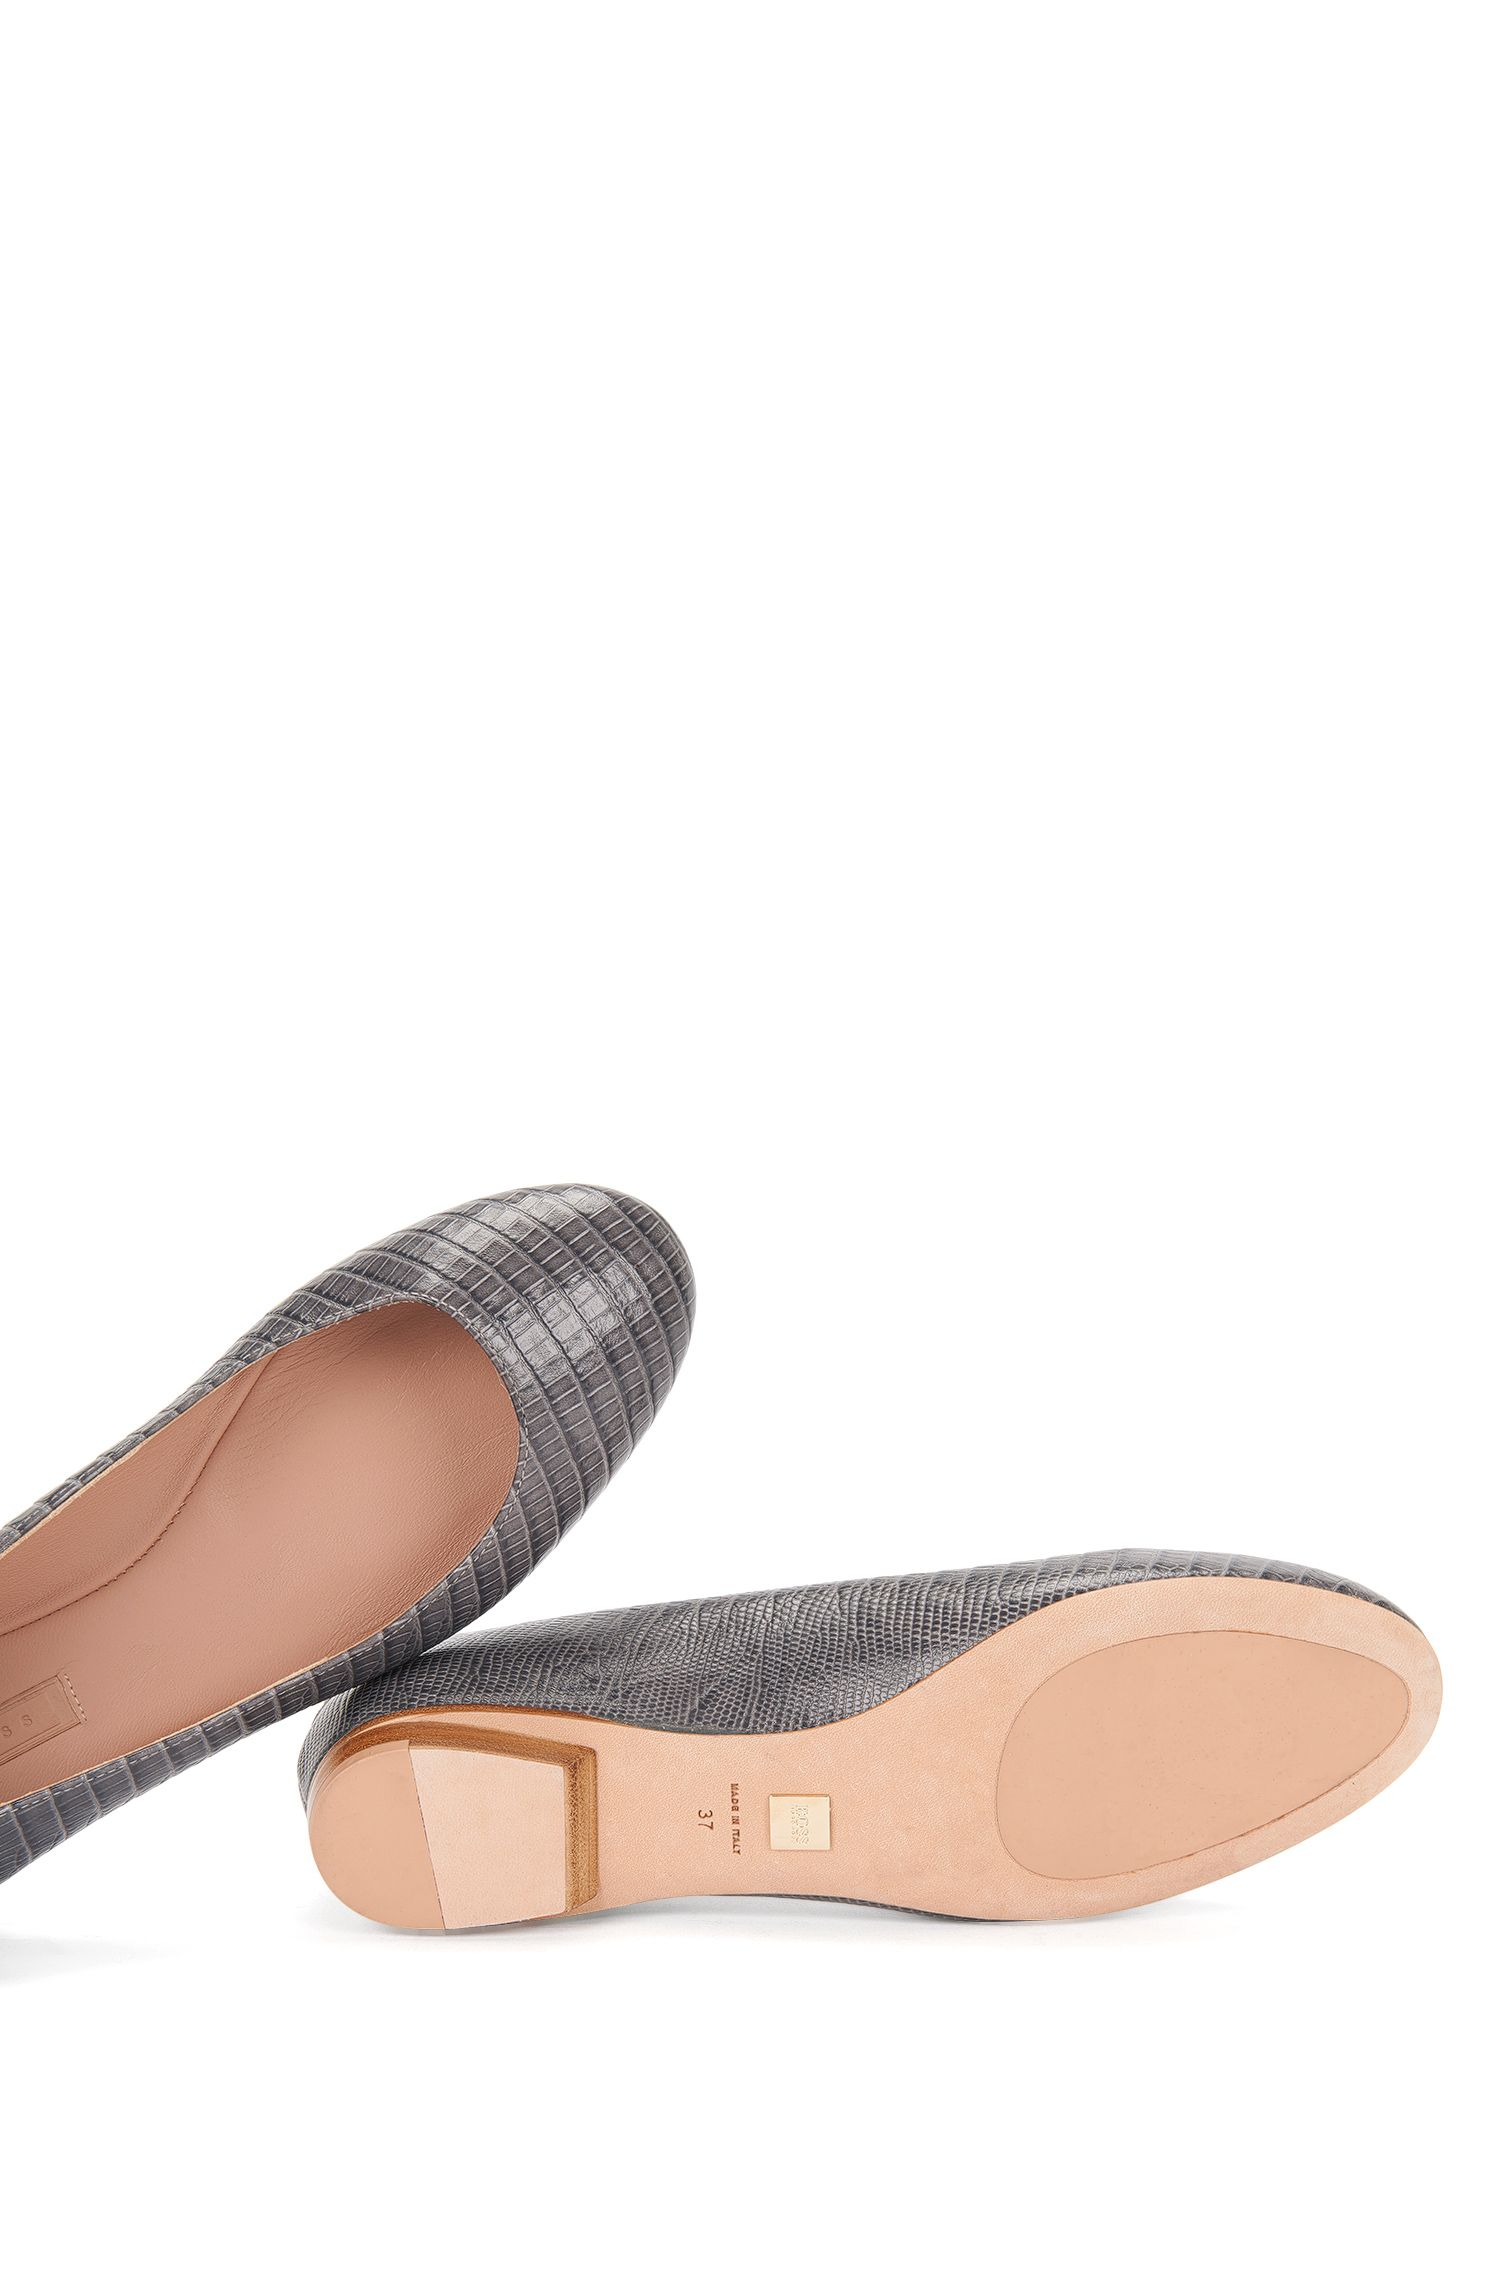 Chaussures plates en cuir gravé: «Staple Ballerina-L»